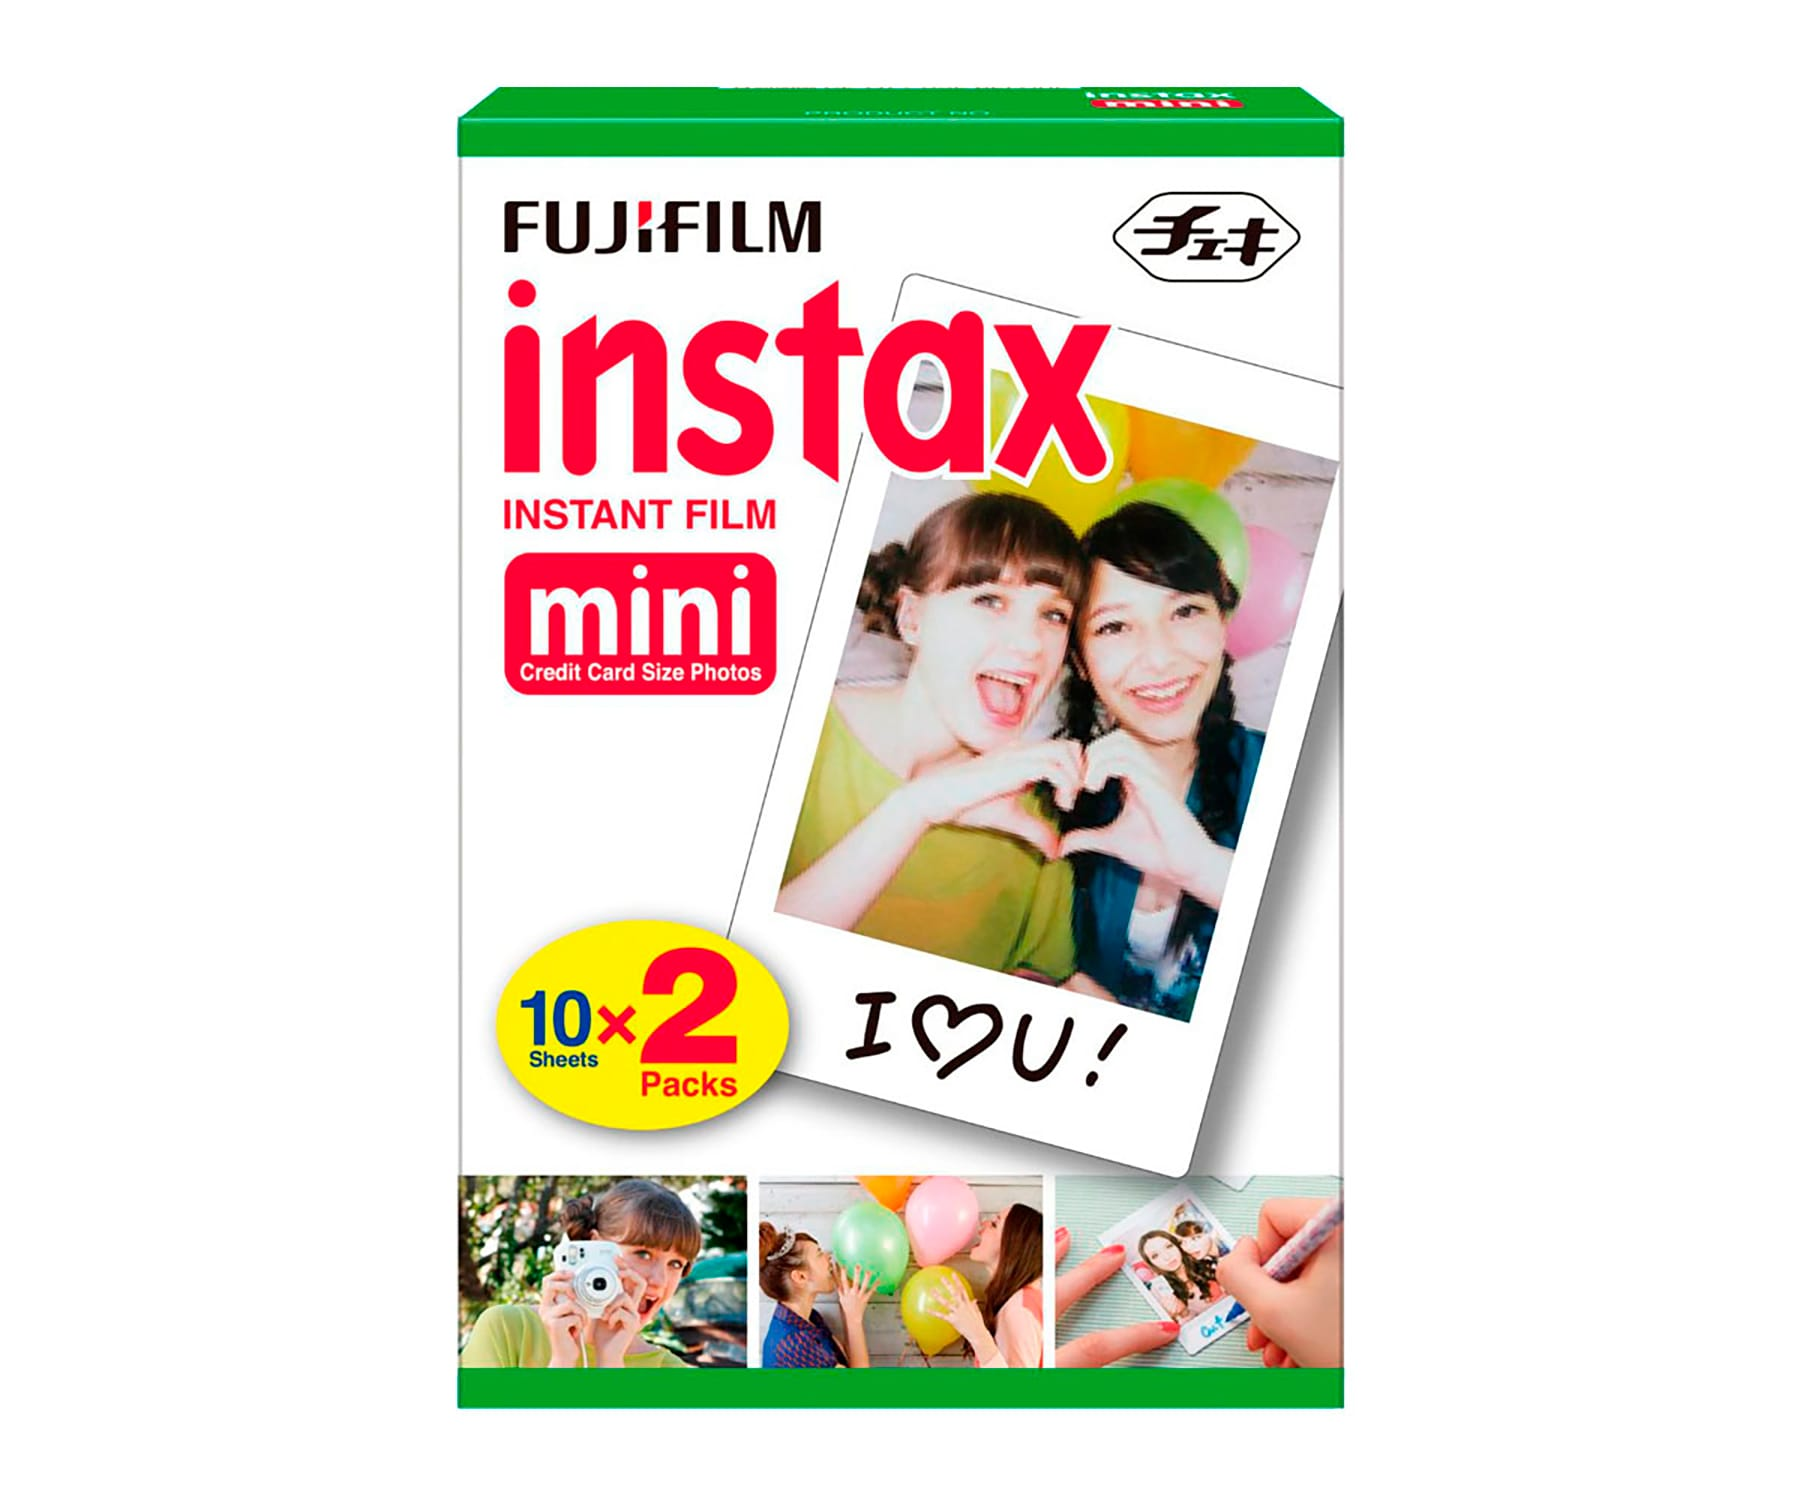 FUJIFILM INSTAX MINI 2X10/ PELICULA FOTOGRÁFICA INSTANTÁNEA